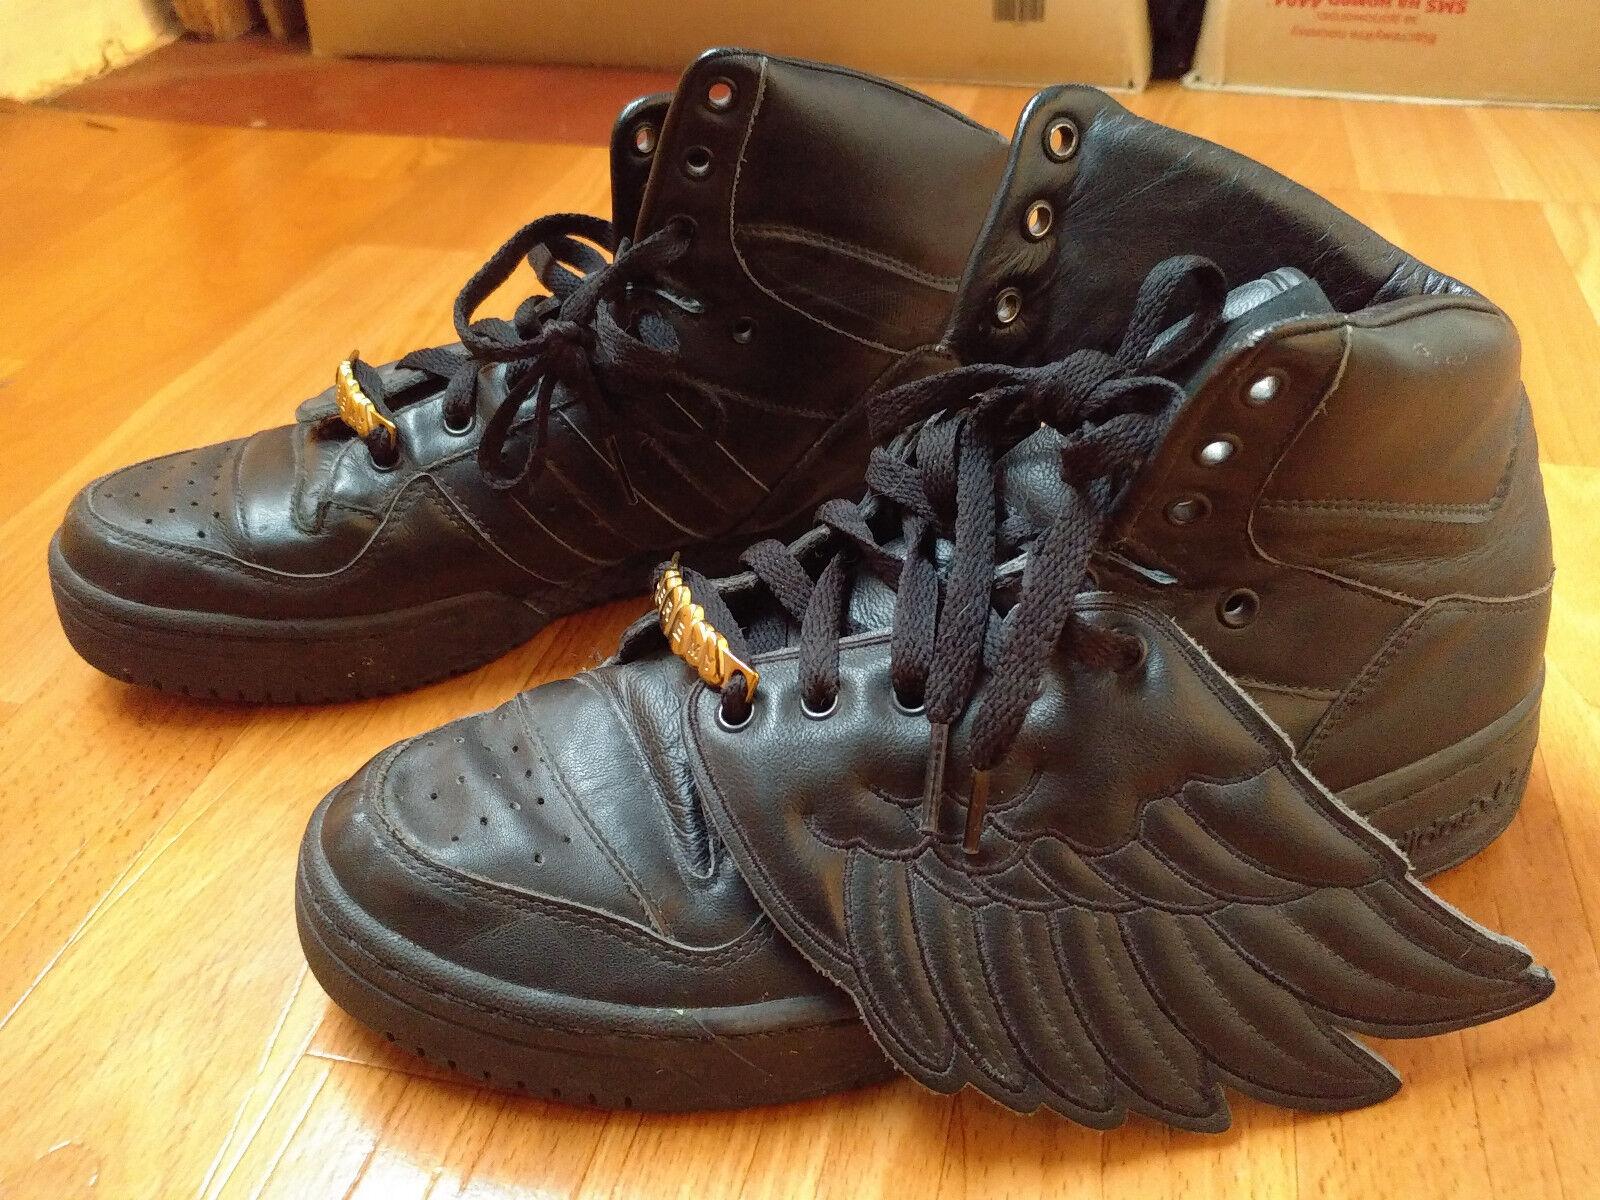 Adidas Jeremy Scott Sneakers Wings Blackout 2.0 Instinct shoes G00616 size 8,5